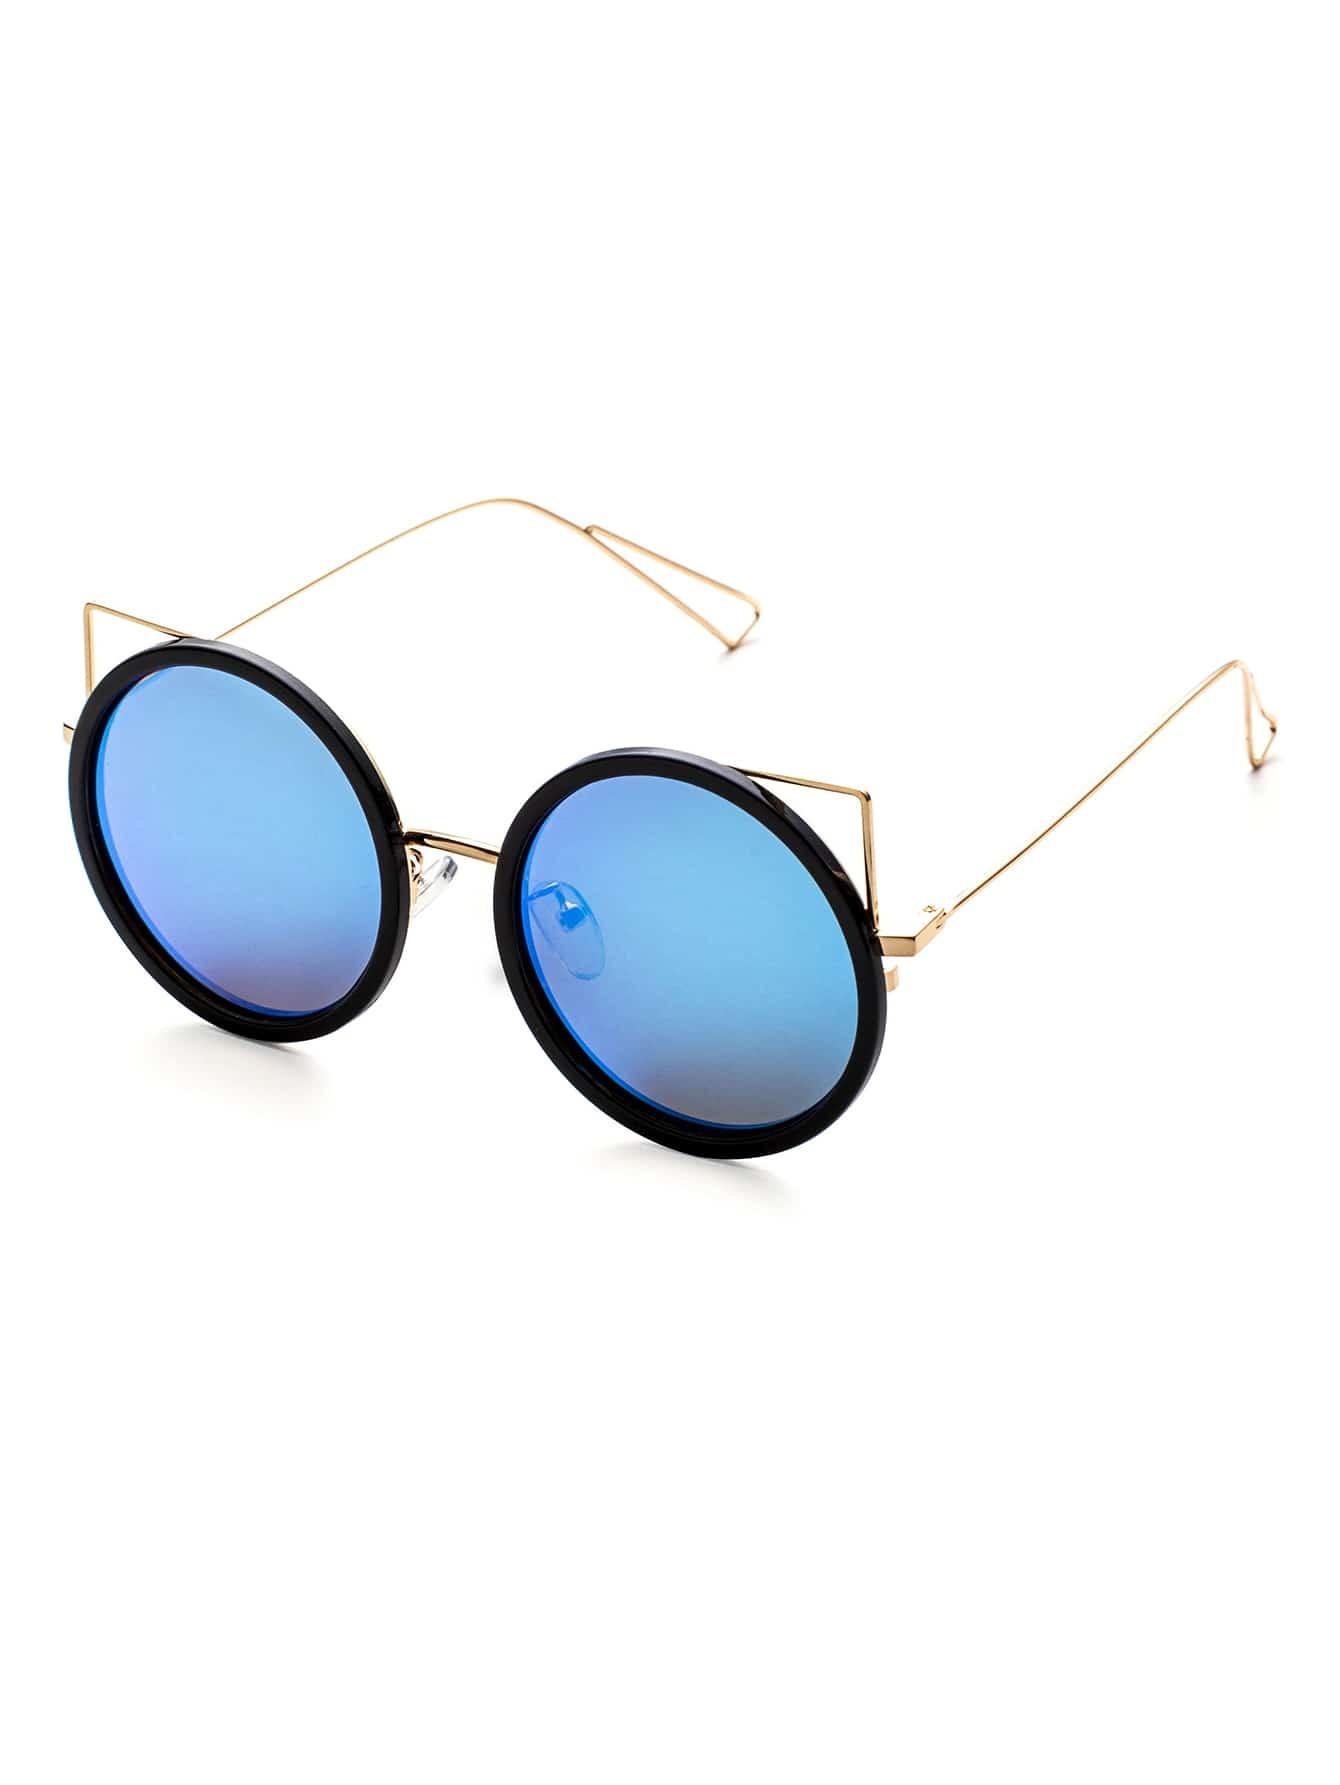 Golden Frame Black Sunglasses : Black And Gold Frame Blue Lens Round Design Sunglasses